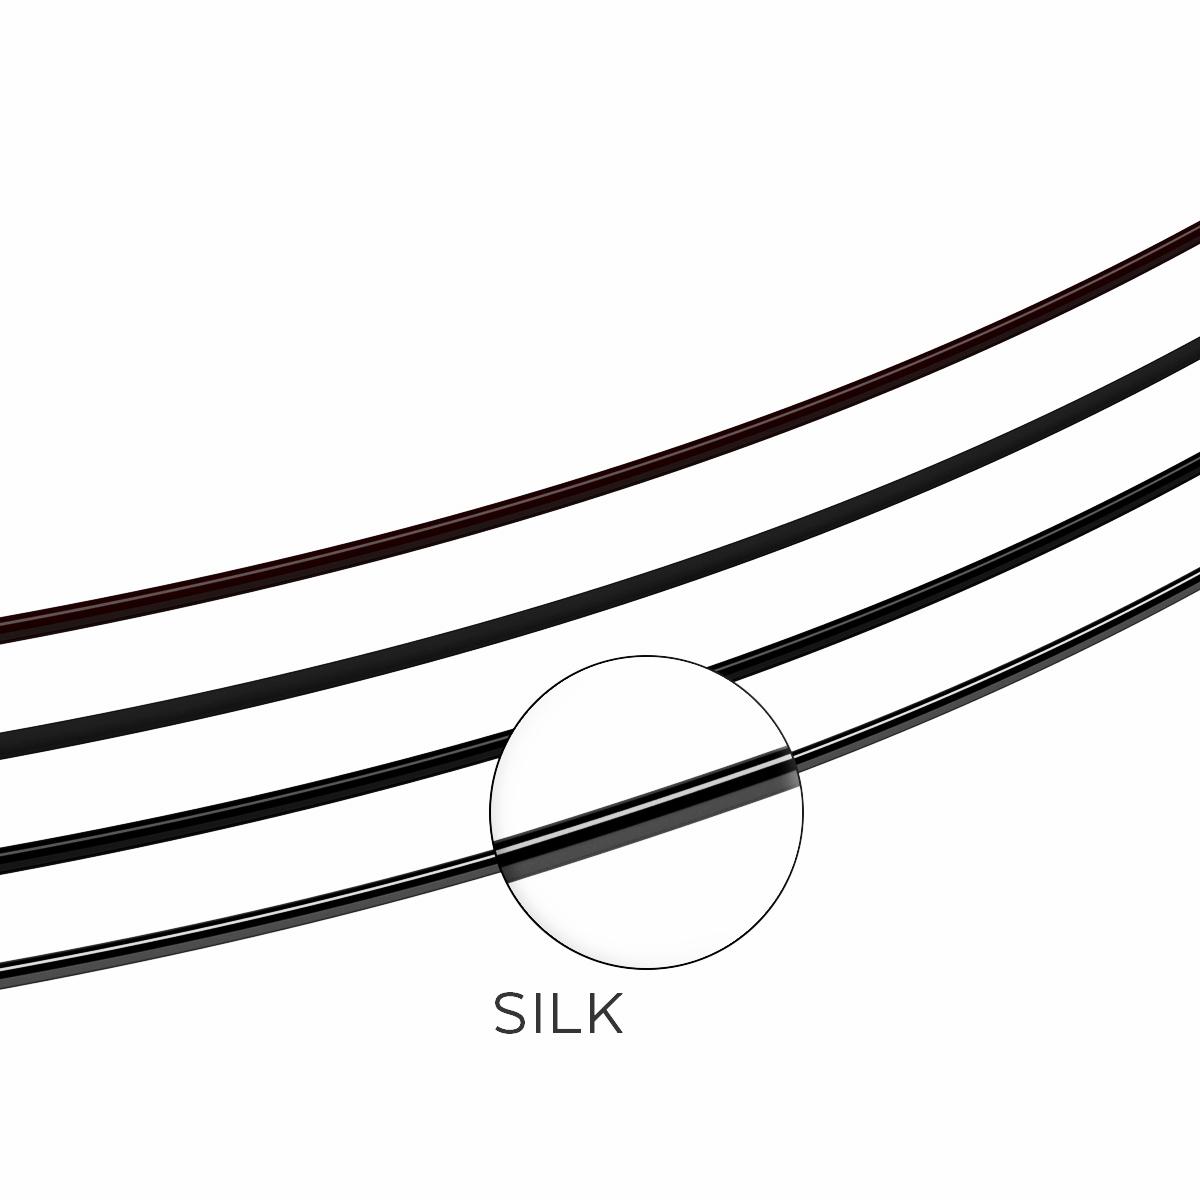 rzesy-silk-black-d-0-2